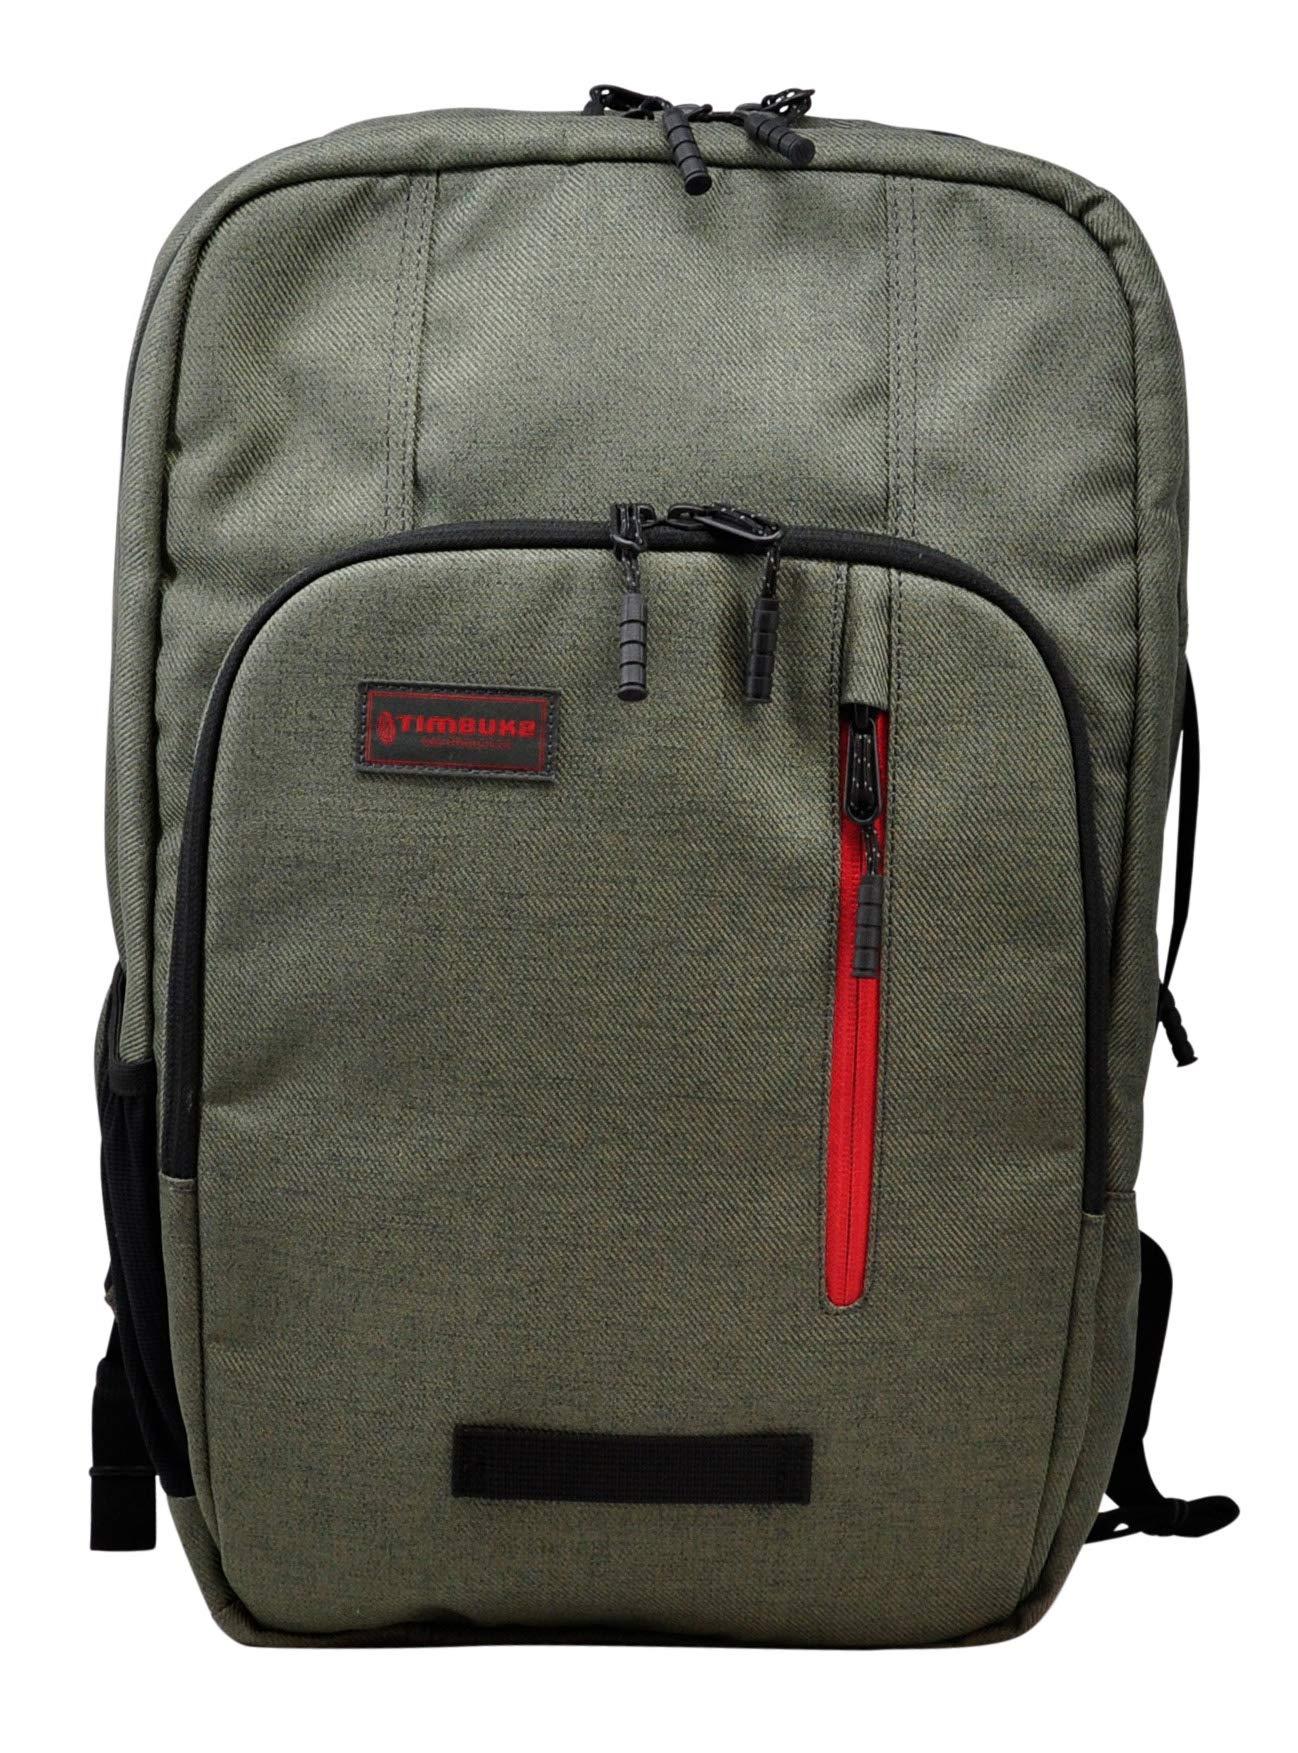 Timbuk2 Uptown Laptop Backpack (Concrete)